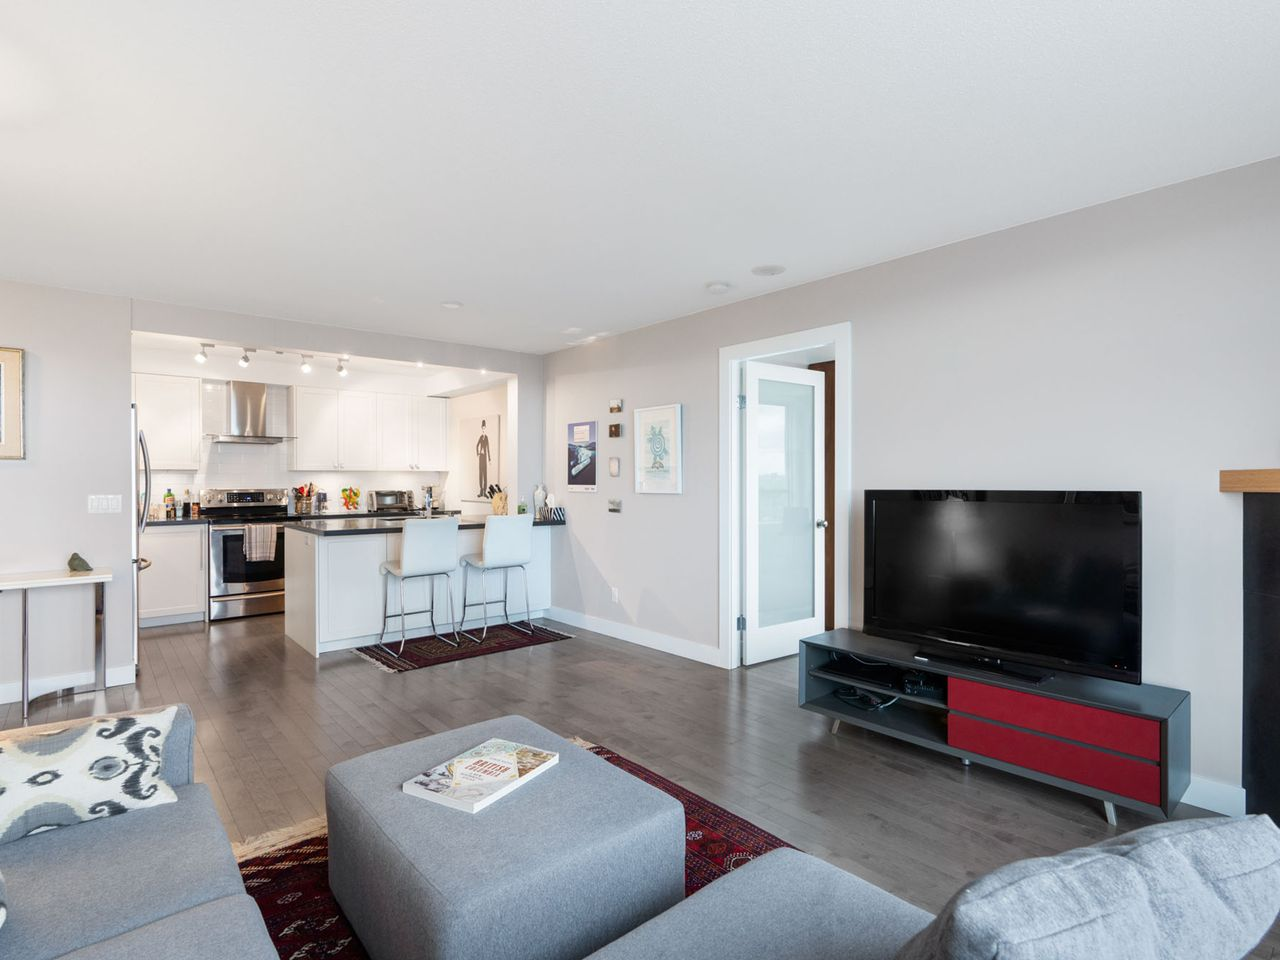 807-4160-albert-st_gavin-4611 at 807 - 4160 Albert Street, Vancouver Heights, Burnaby North